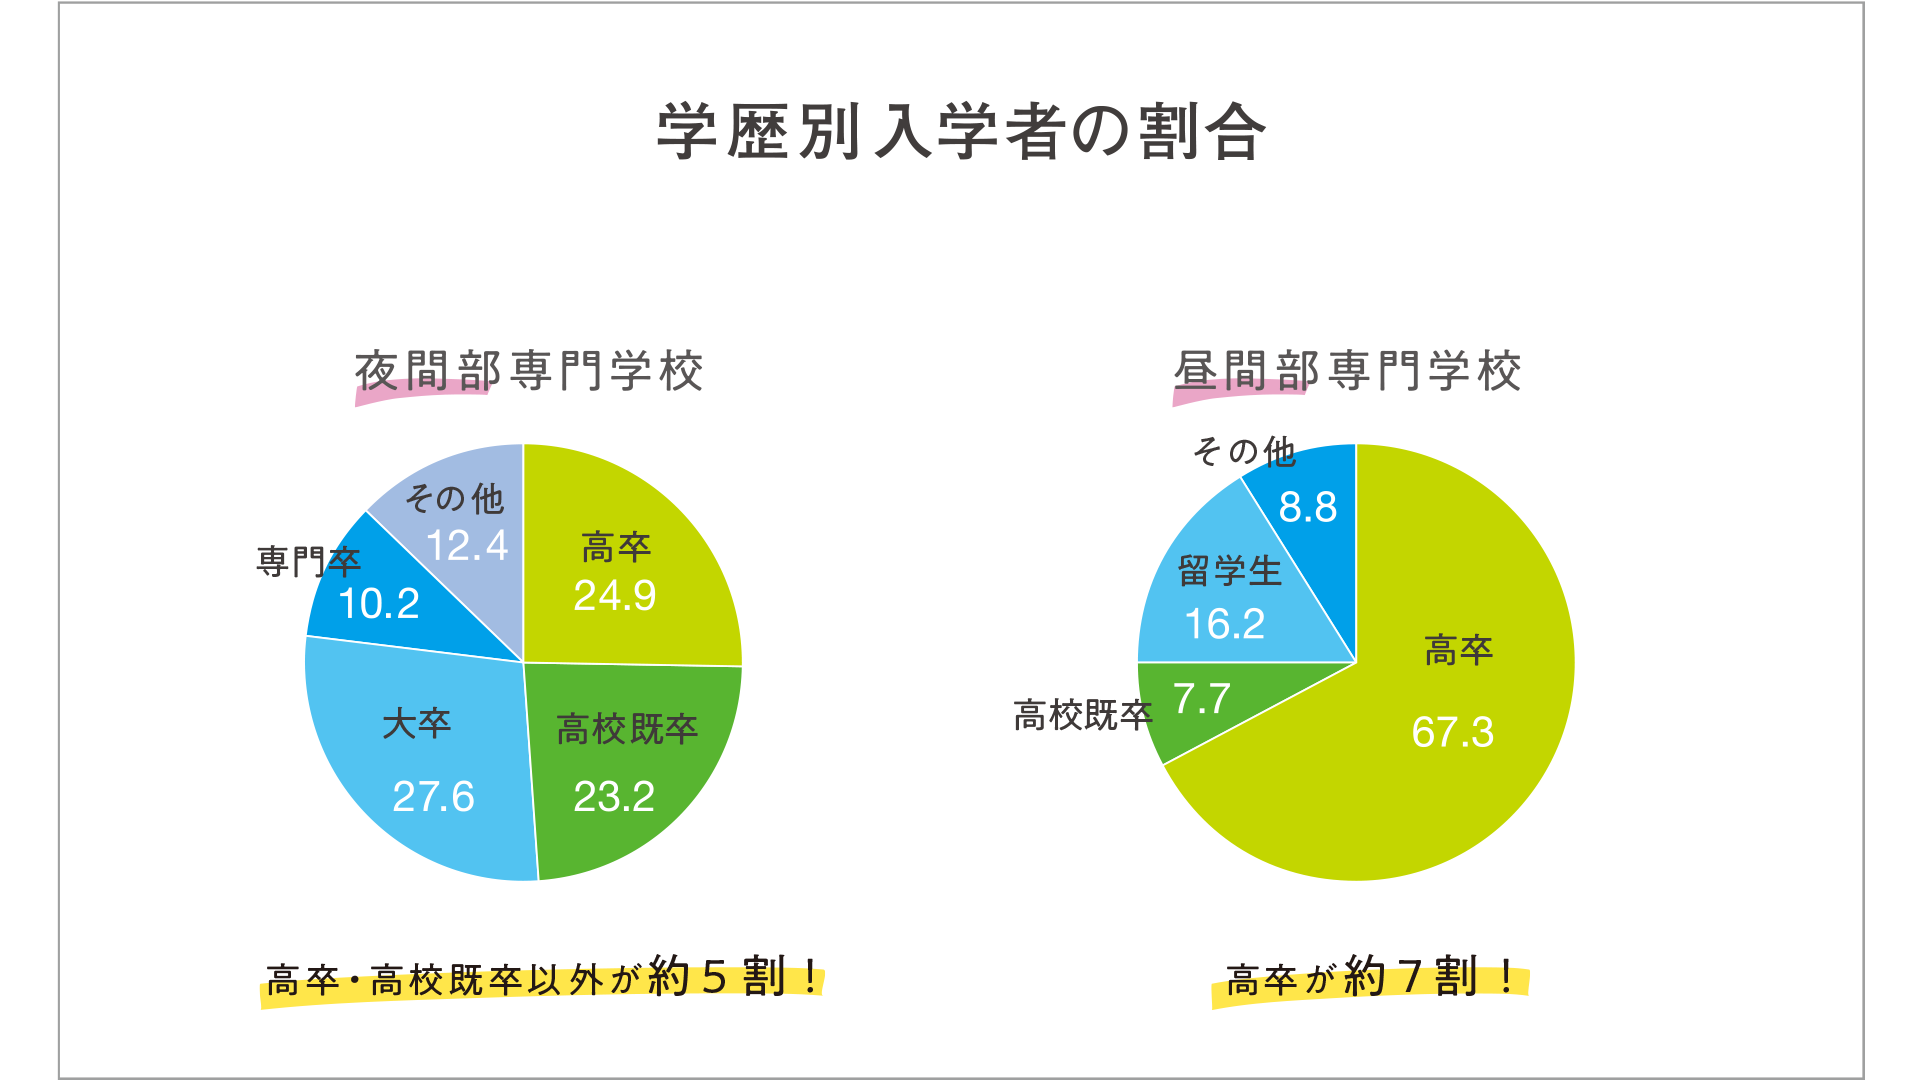 学歴別入学者の割合